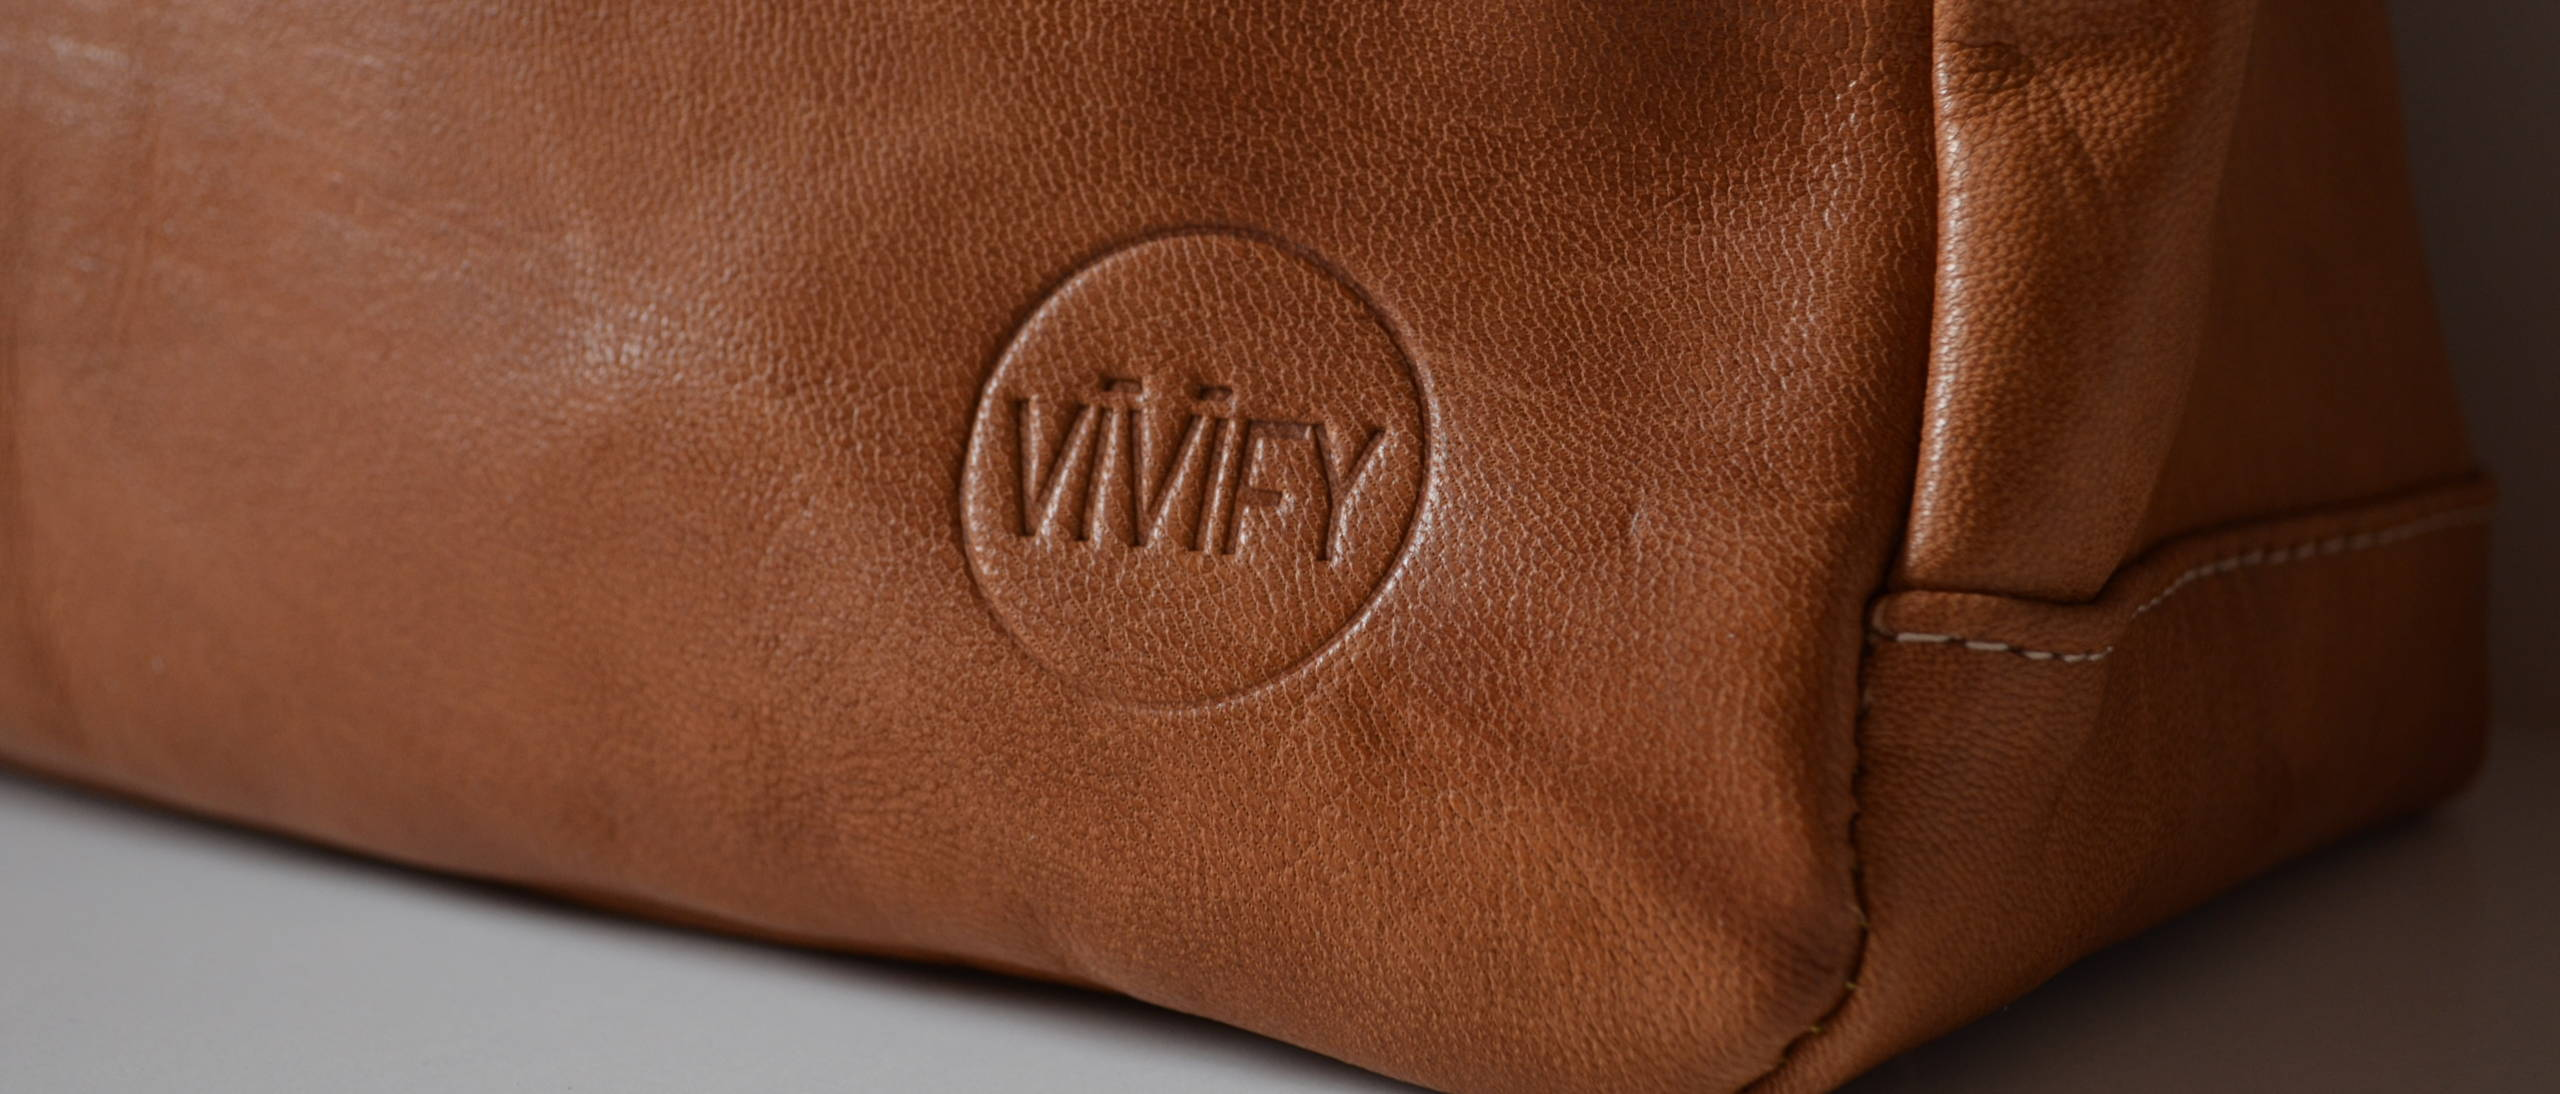 Lederpflege lässt dein Produkt länger glänzen